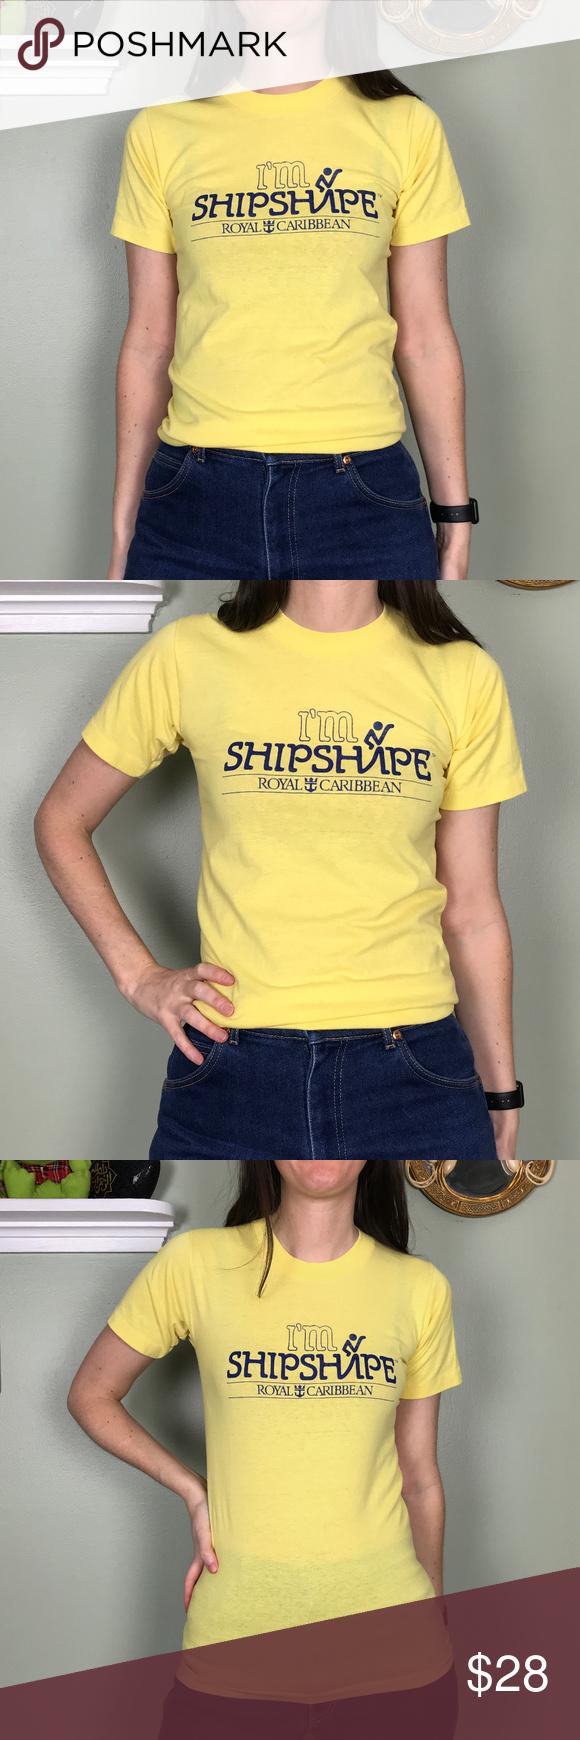 Vintage 1980's I'm Shipshape Royal Caribbean Tee Tees, T